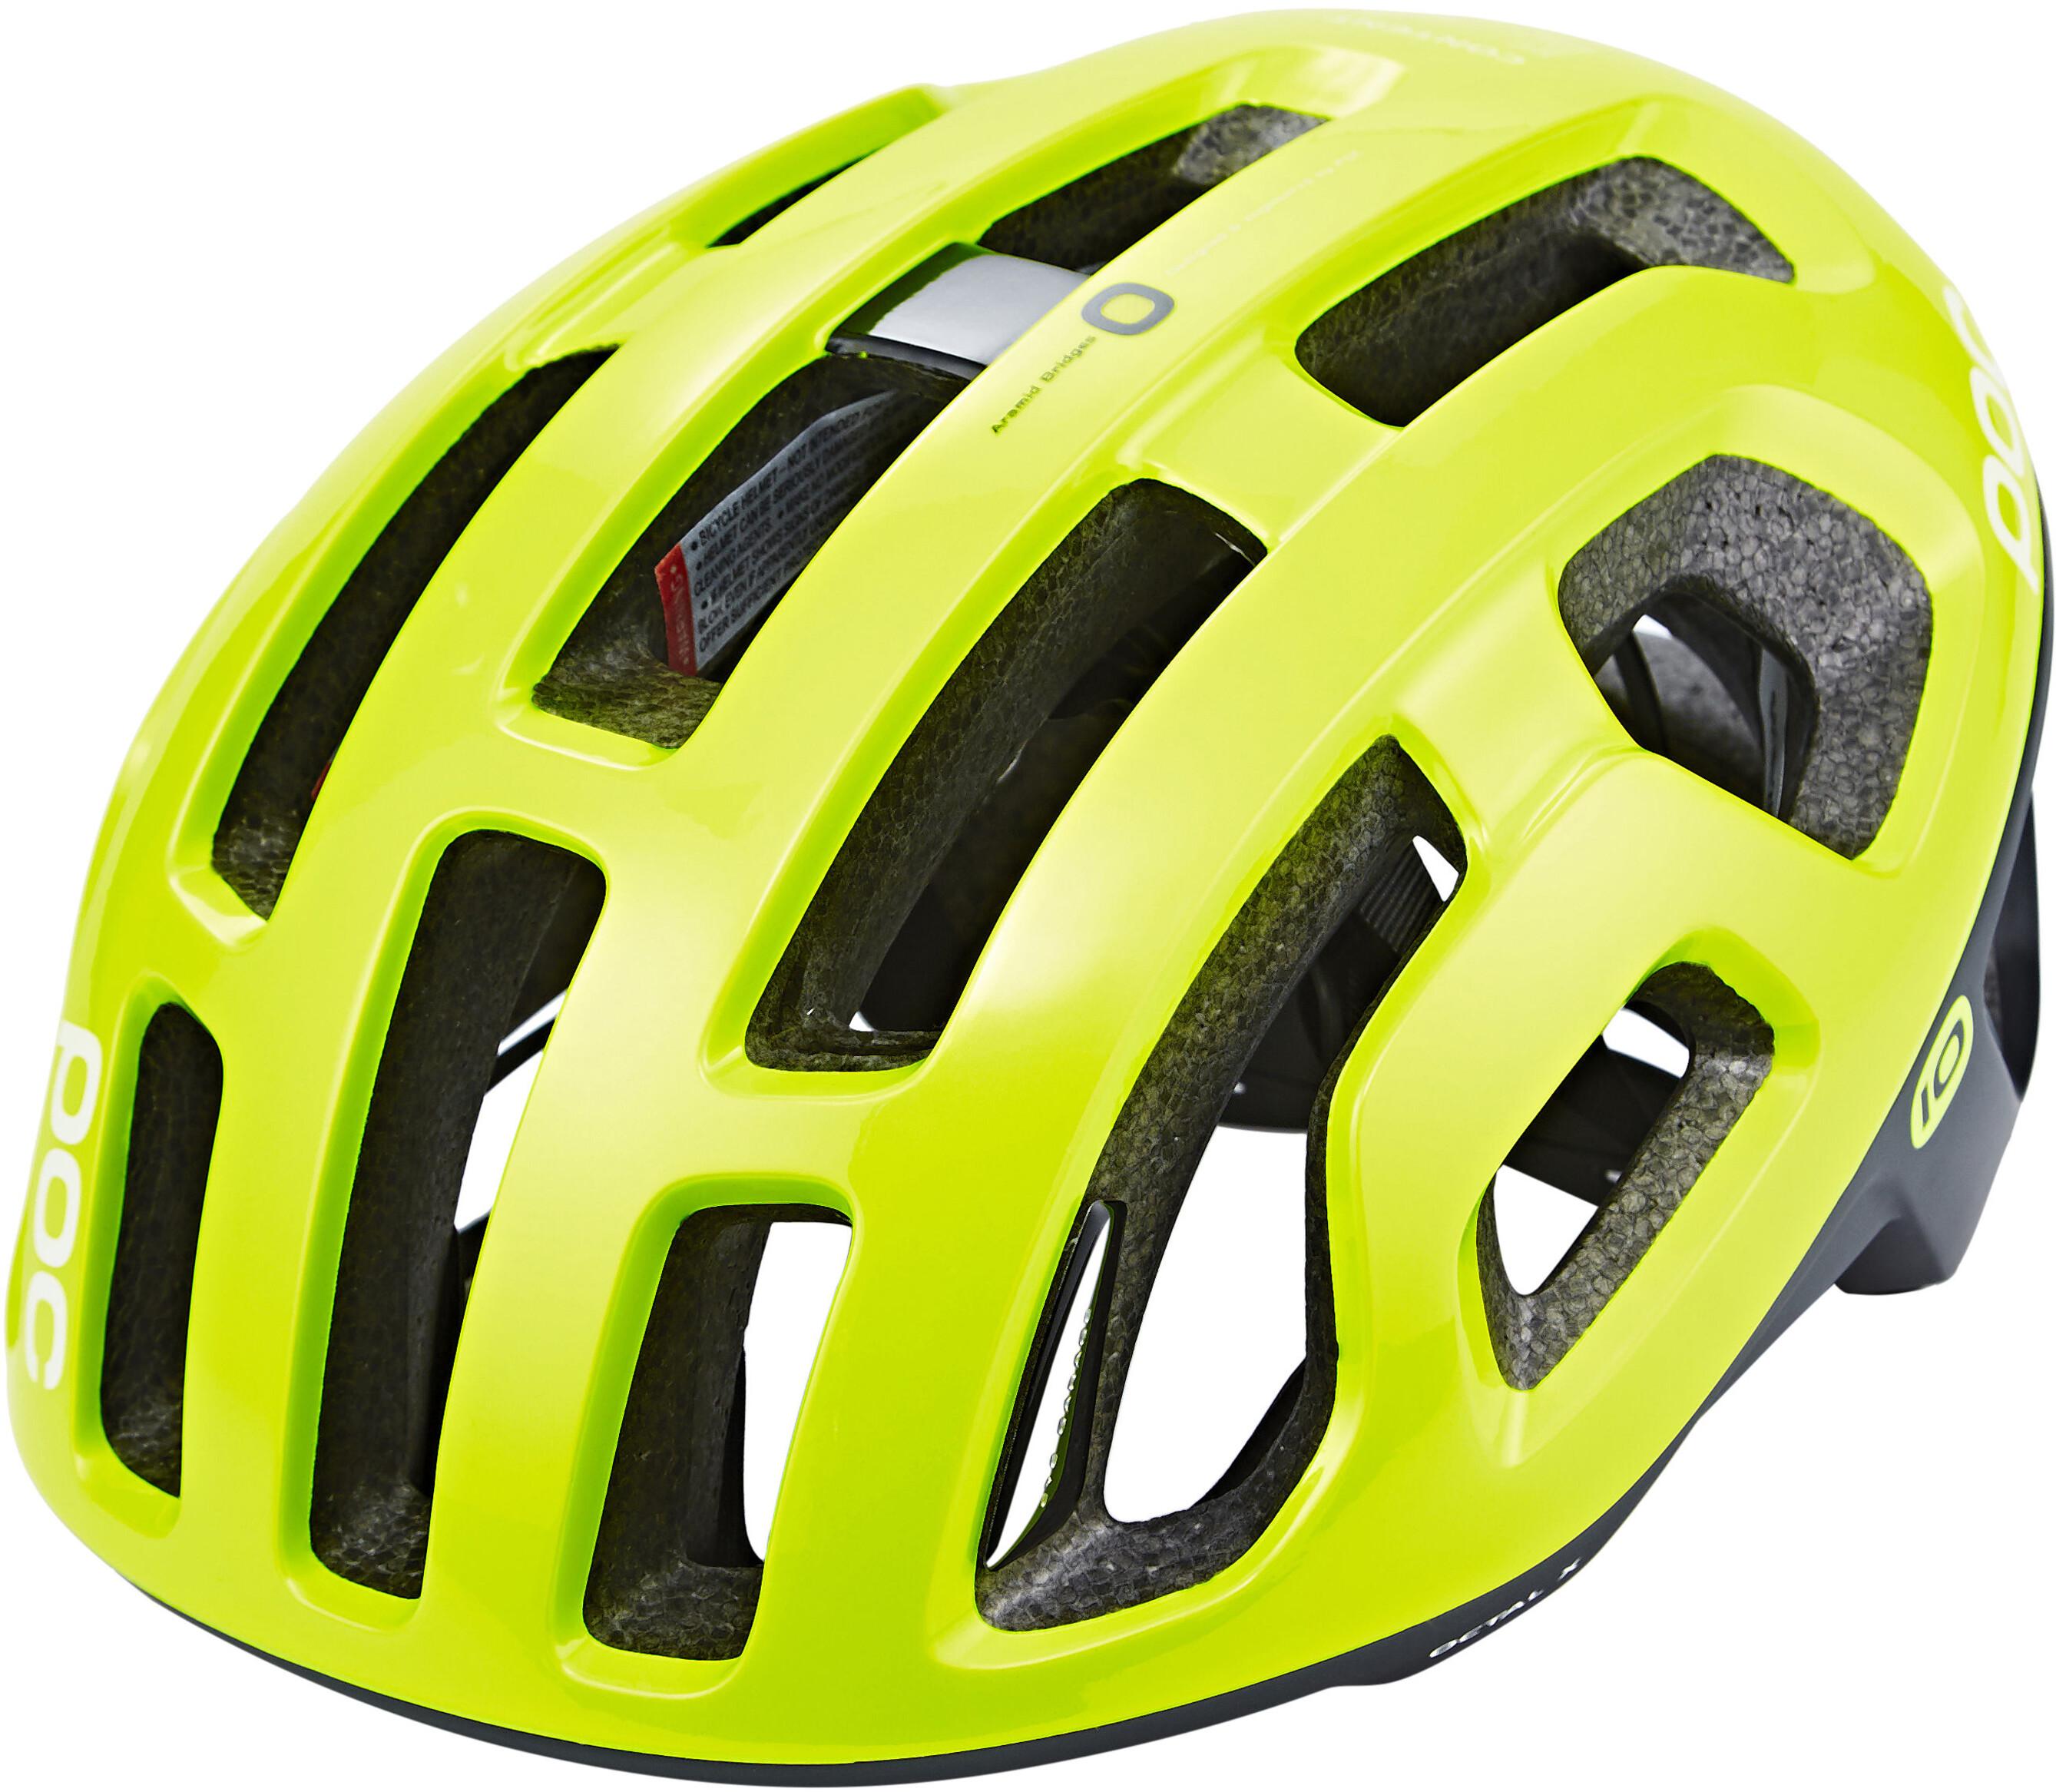 poc octal x helmet unobtanium yellow online kaufen. Black Bedroom Furniture Sets. Home Design Ideas